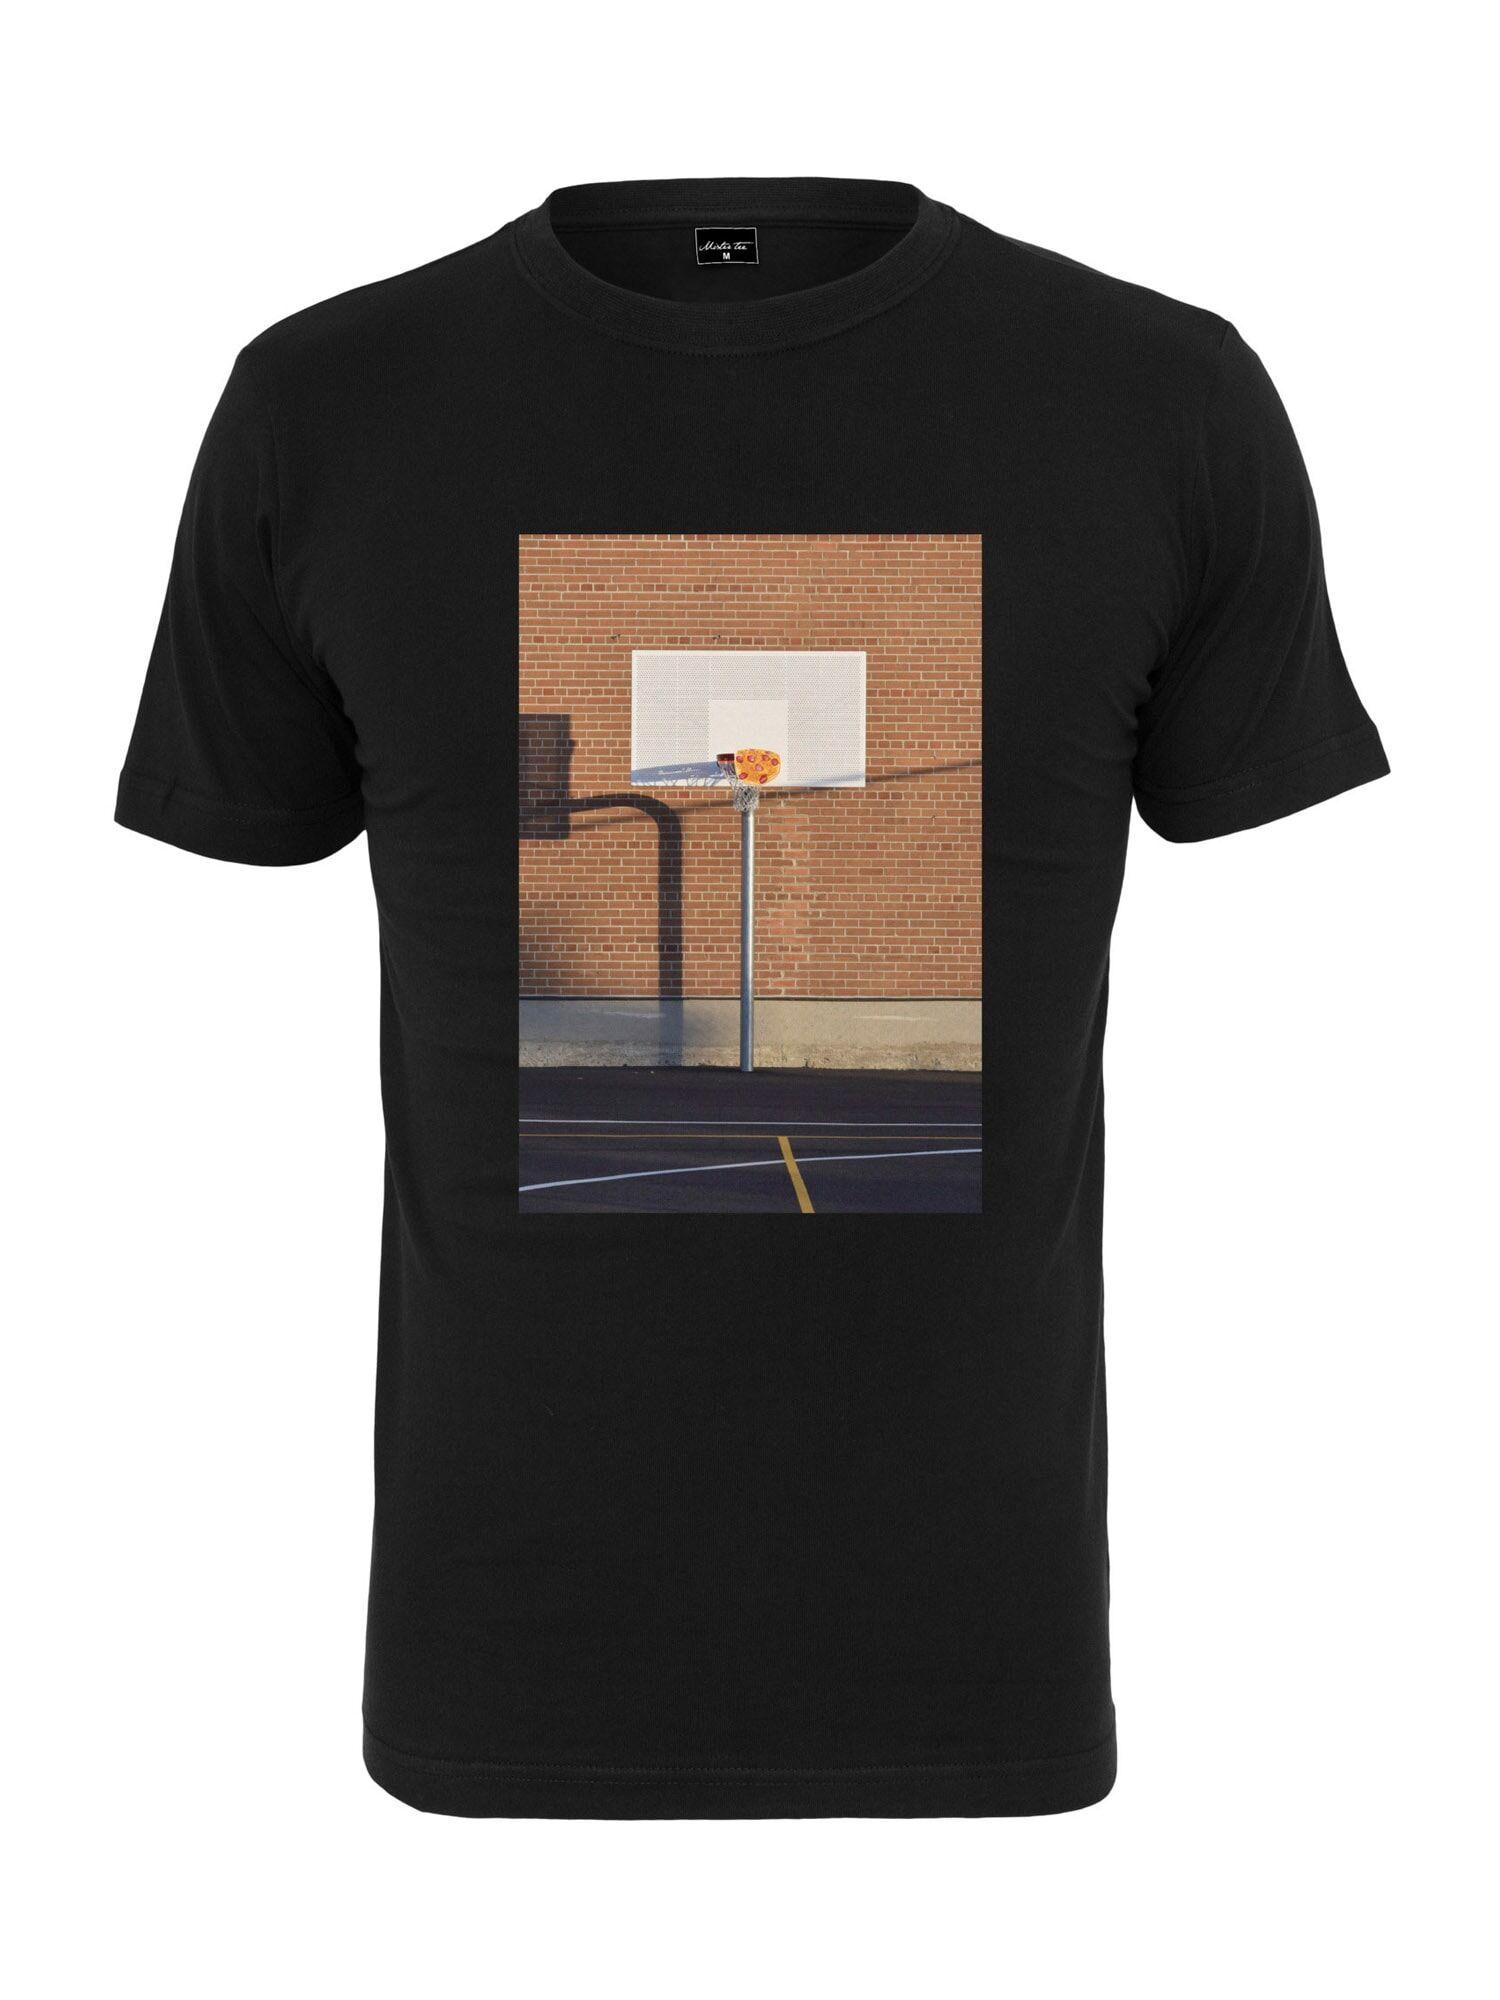 Tee T-Shirt 'Pizza Basketball Court'  - Noir - Taille: XXL - male